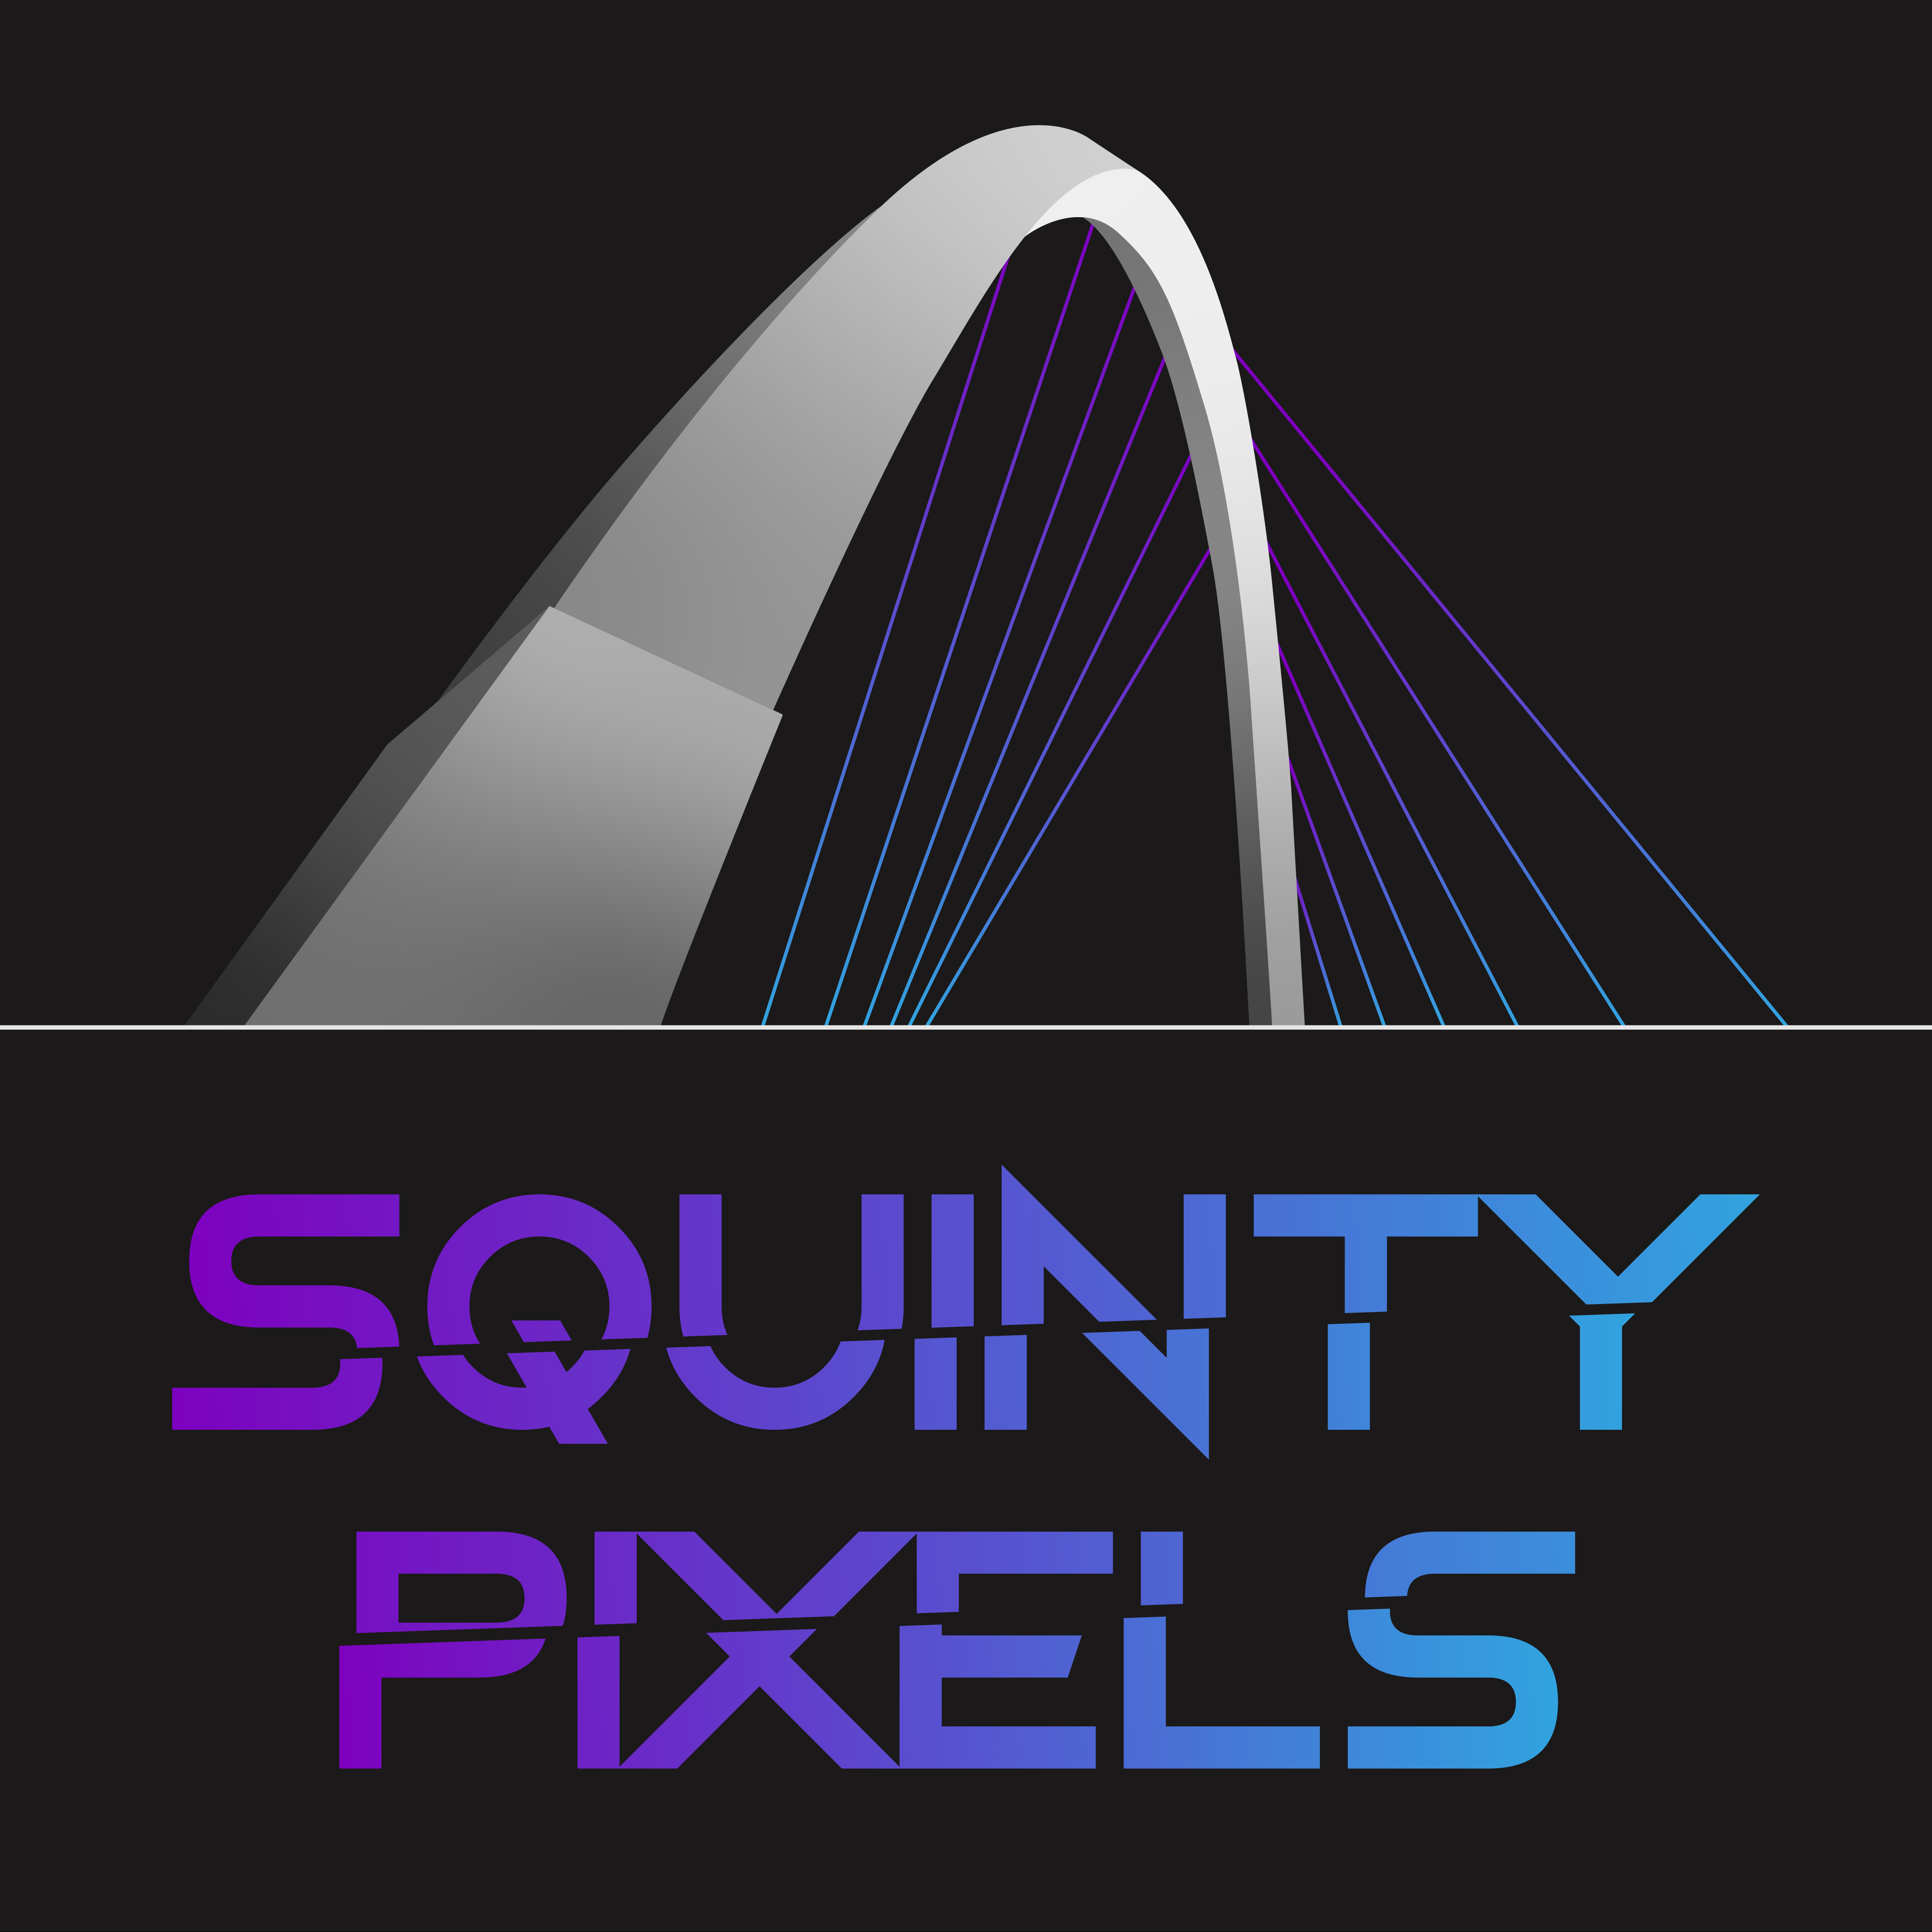 Squinty Pixels